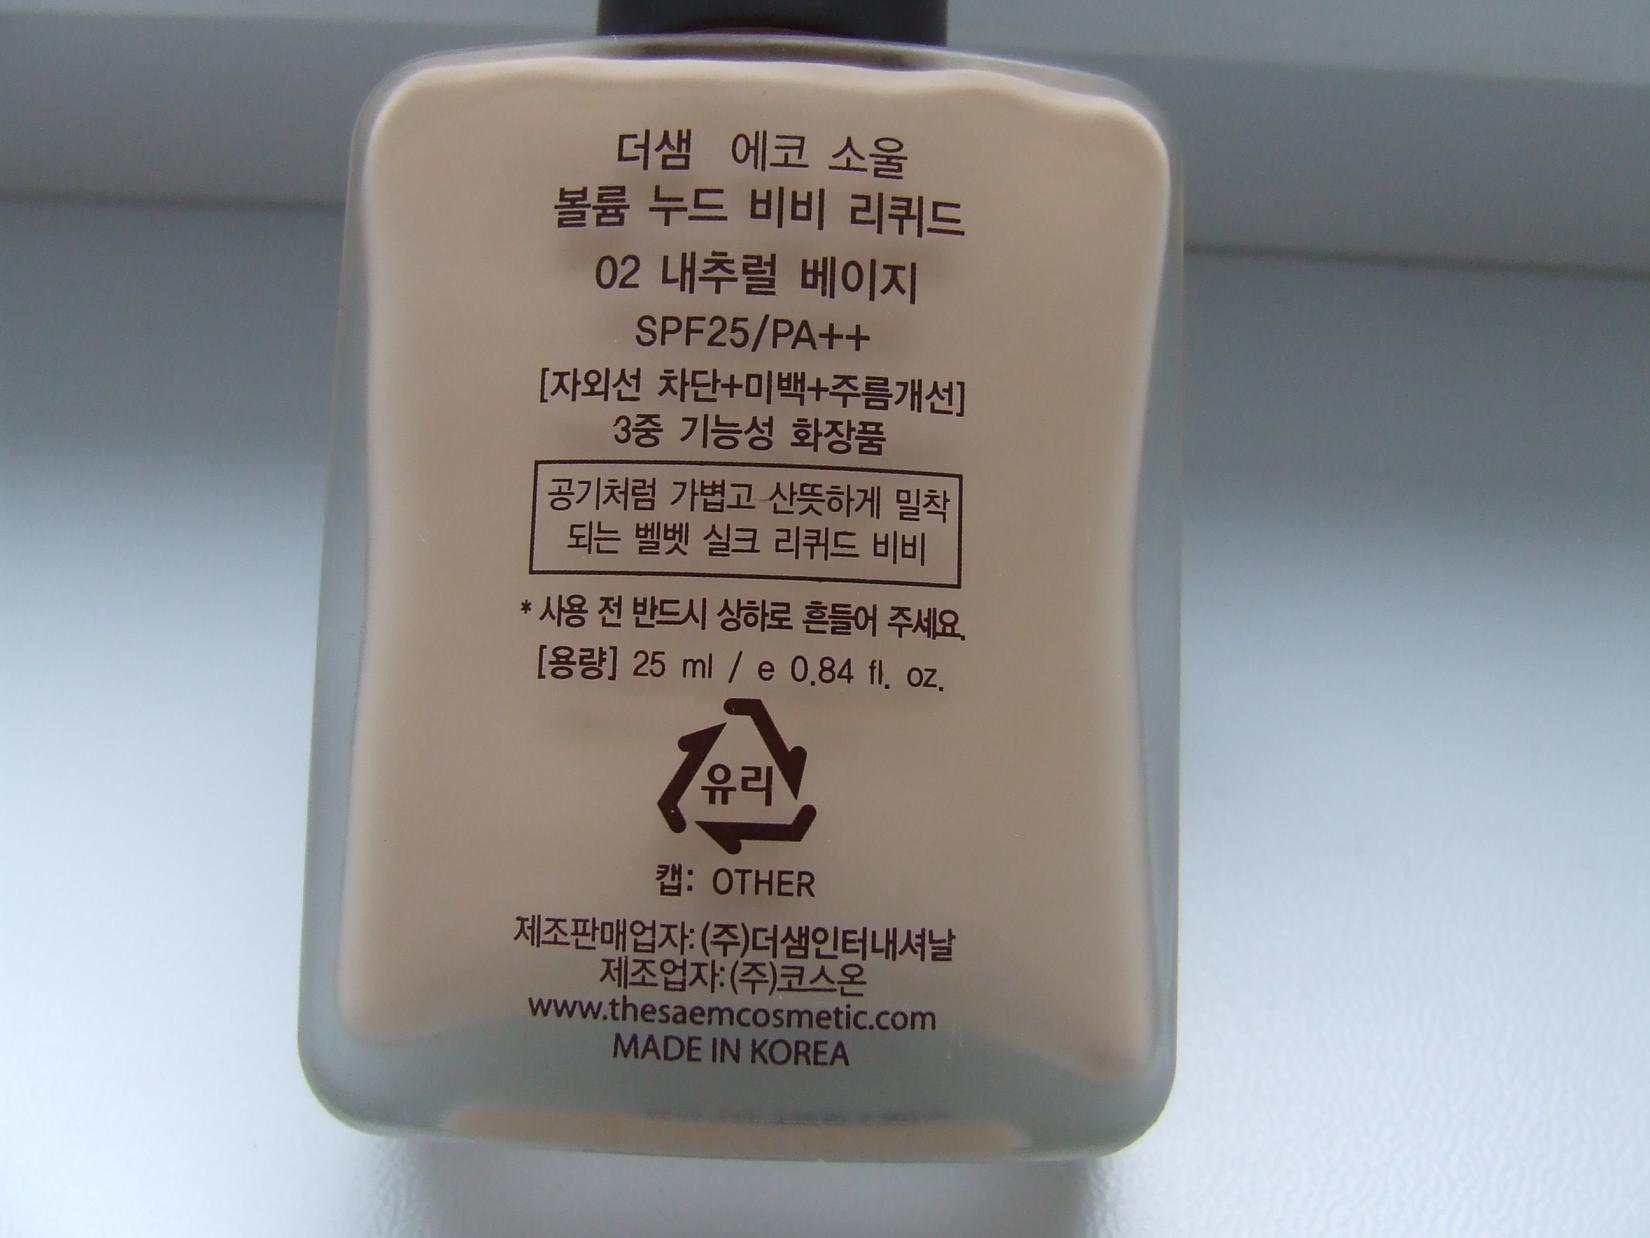 BB-крем The Saem Eco Soul Volume Nude BB Liquid - описание на корейском